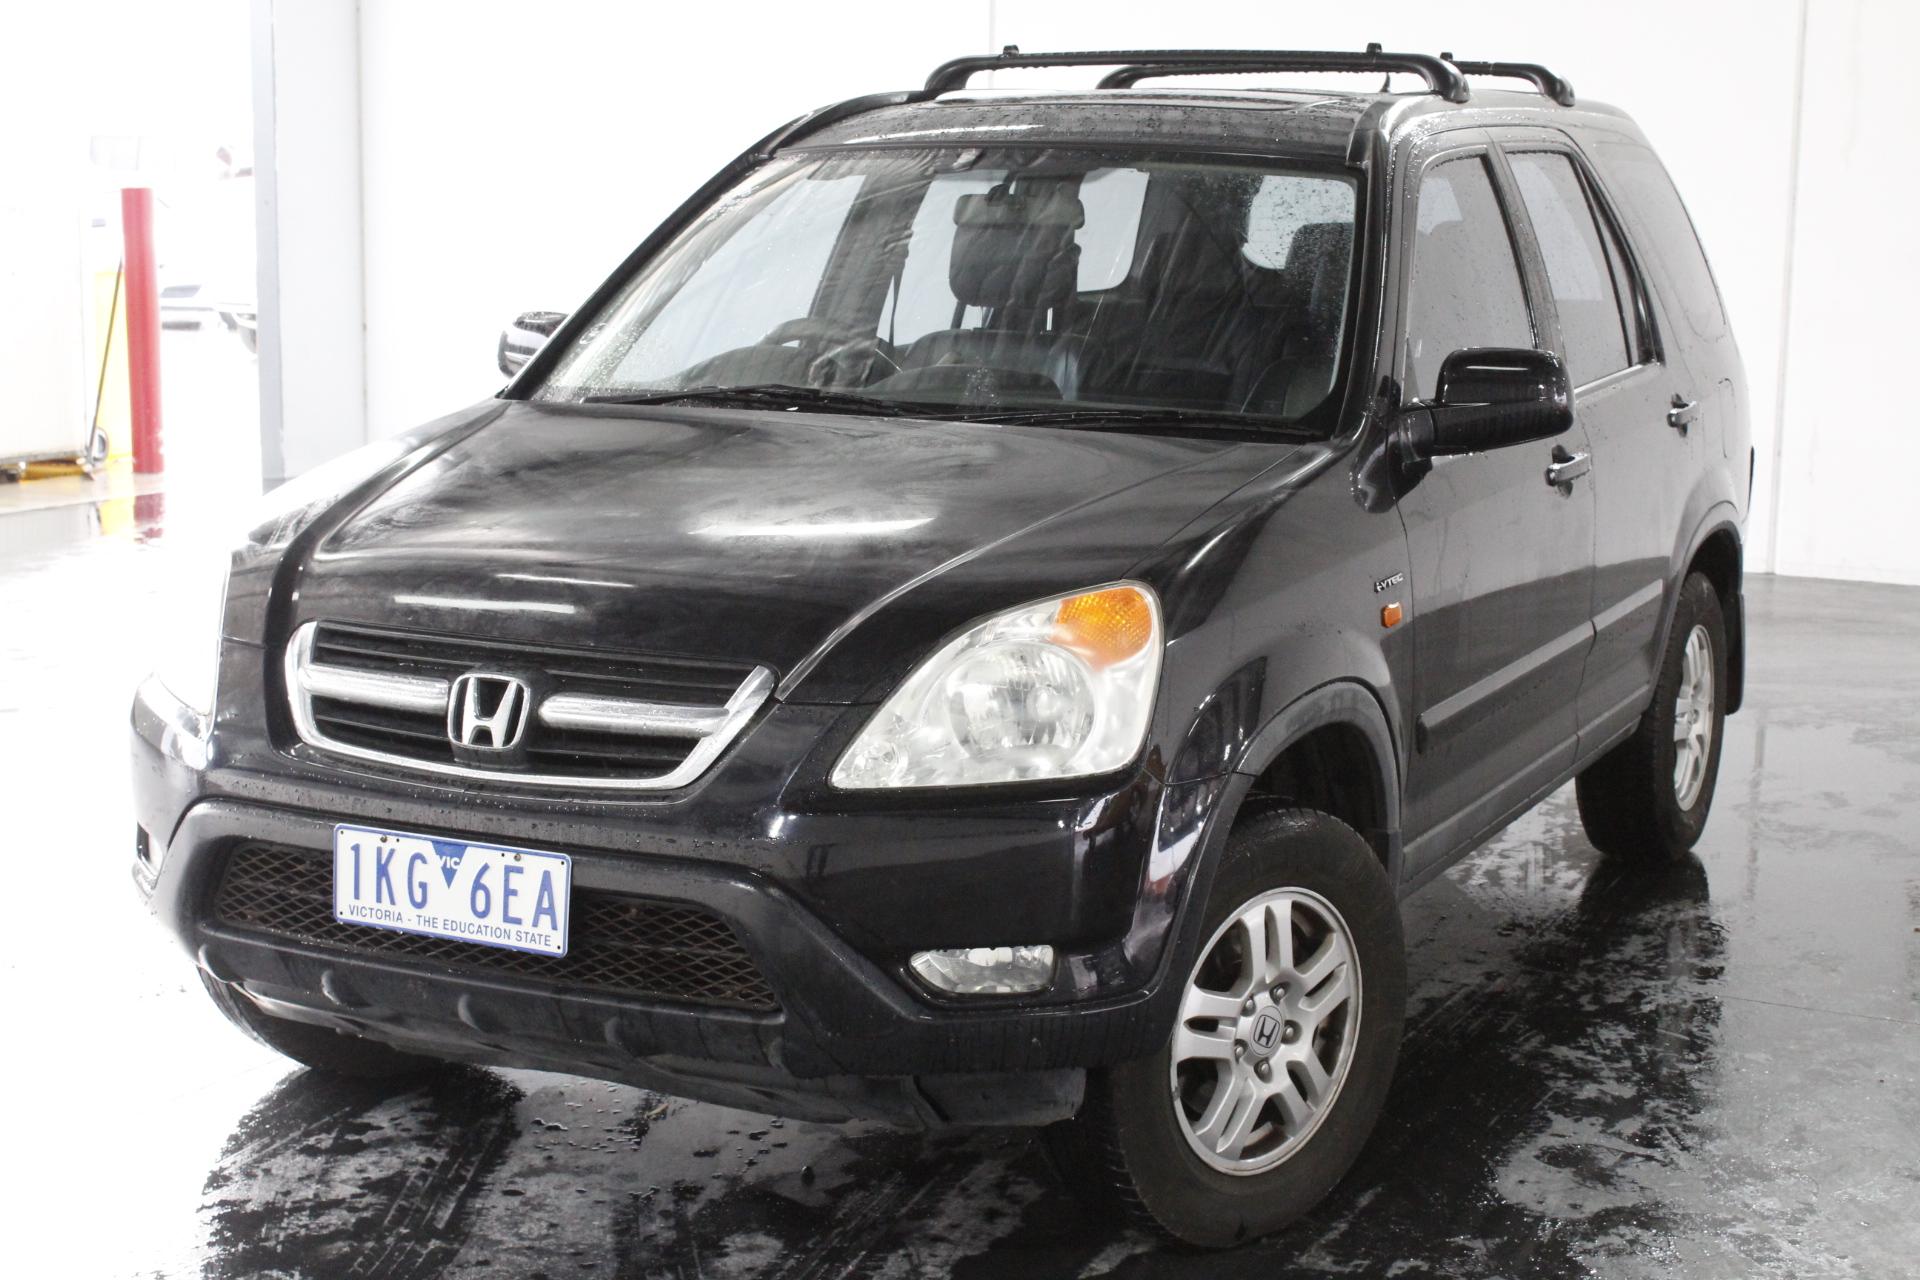 fuel honda km price auto for crv orig l jpg sale